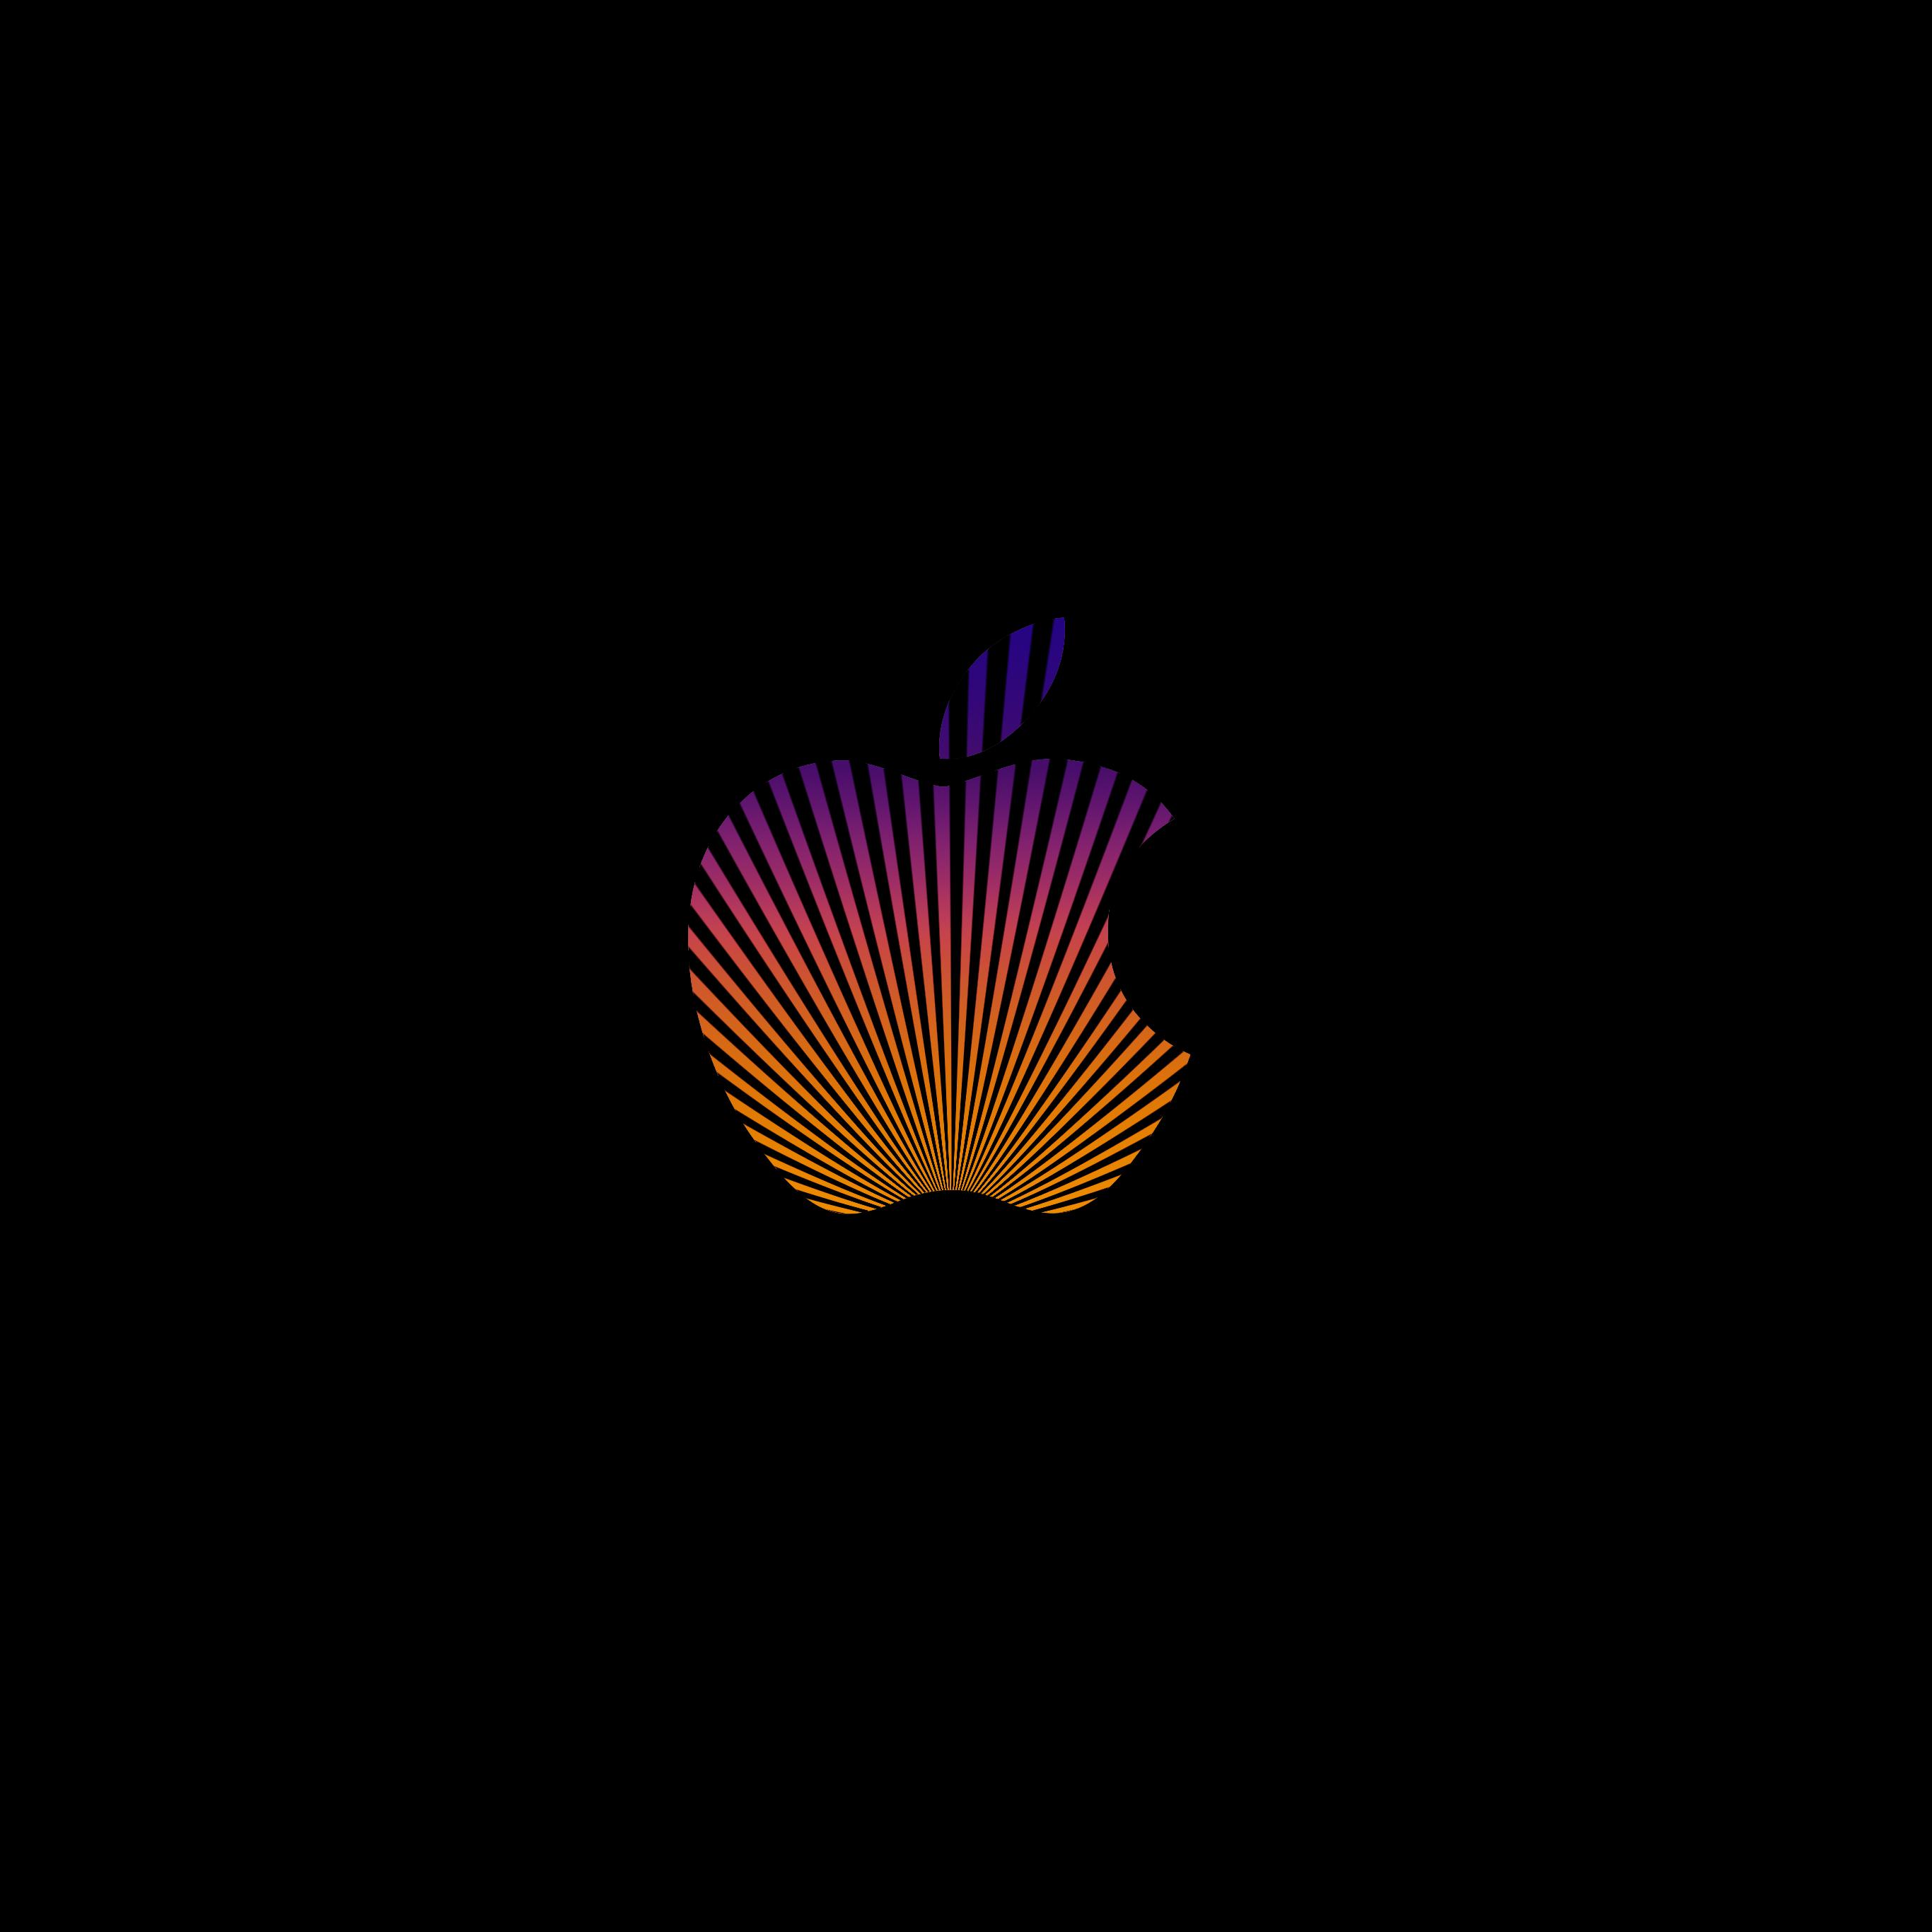 Apple Tower Theatre wallpaper basicappleguy idownloadblog Apple logo iPad